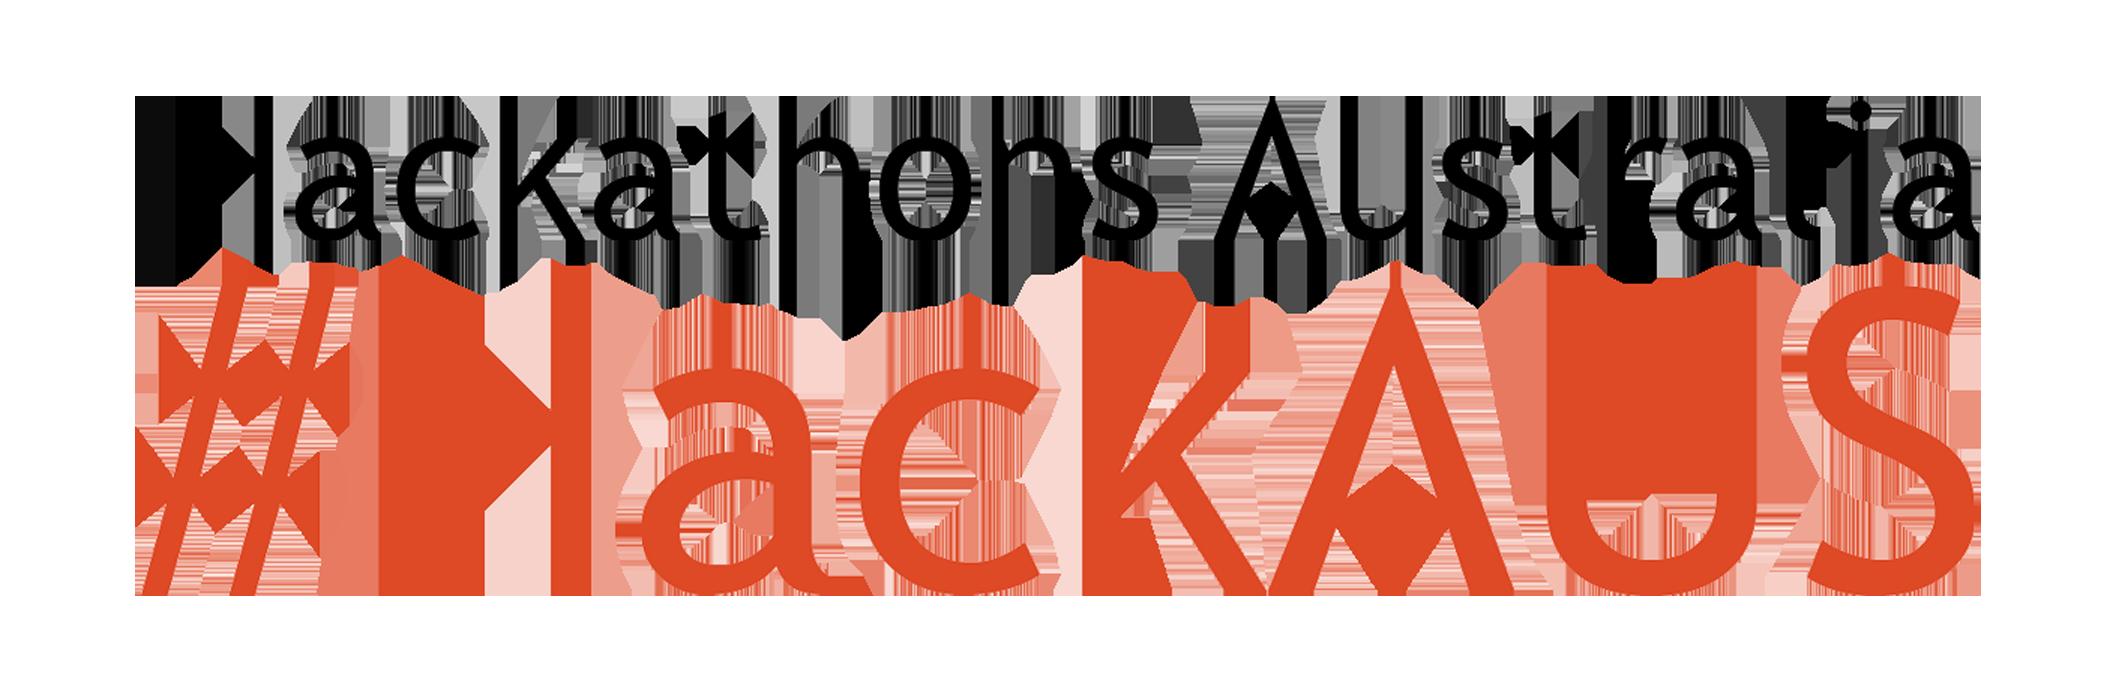 LOGO Hackathon Australia_PNG.png